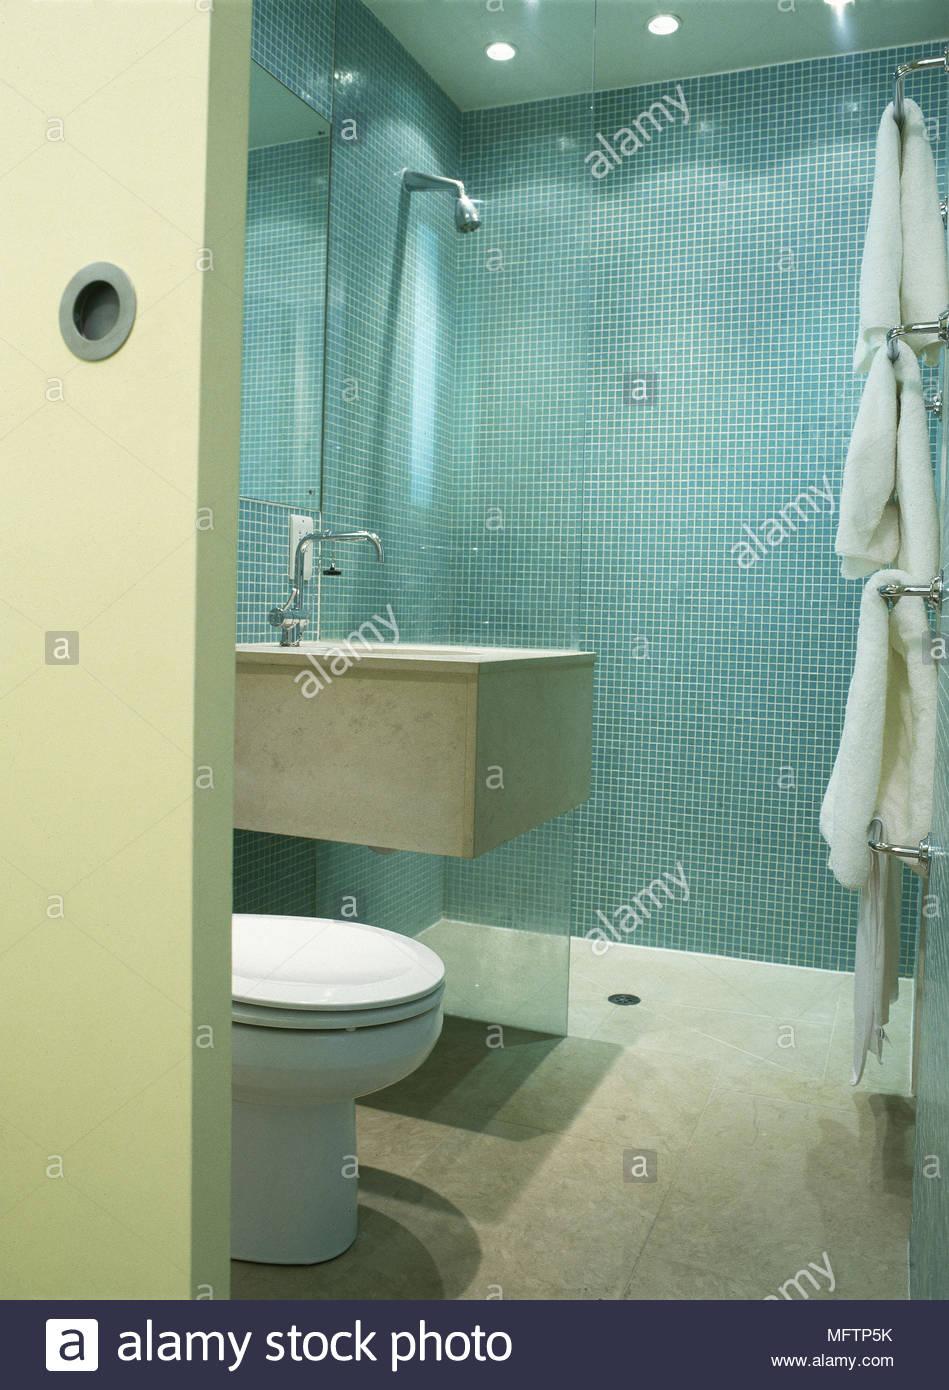 Modernes Badezimmer Detail Blaue Fliesen Mosaik Quadrat Waschbecken Dusche  Wc